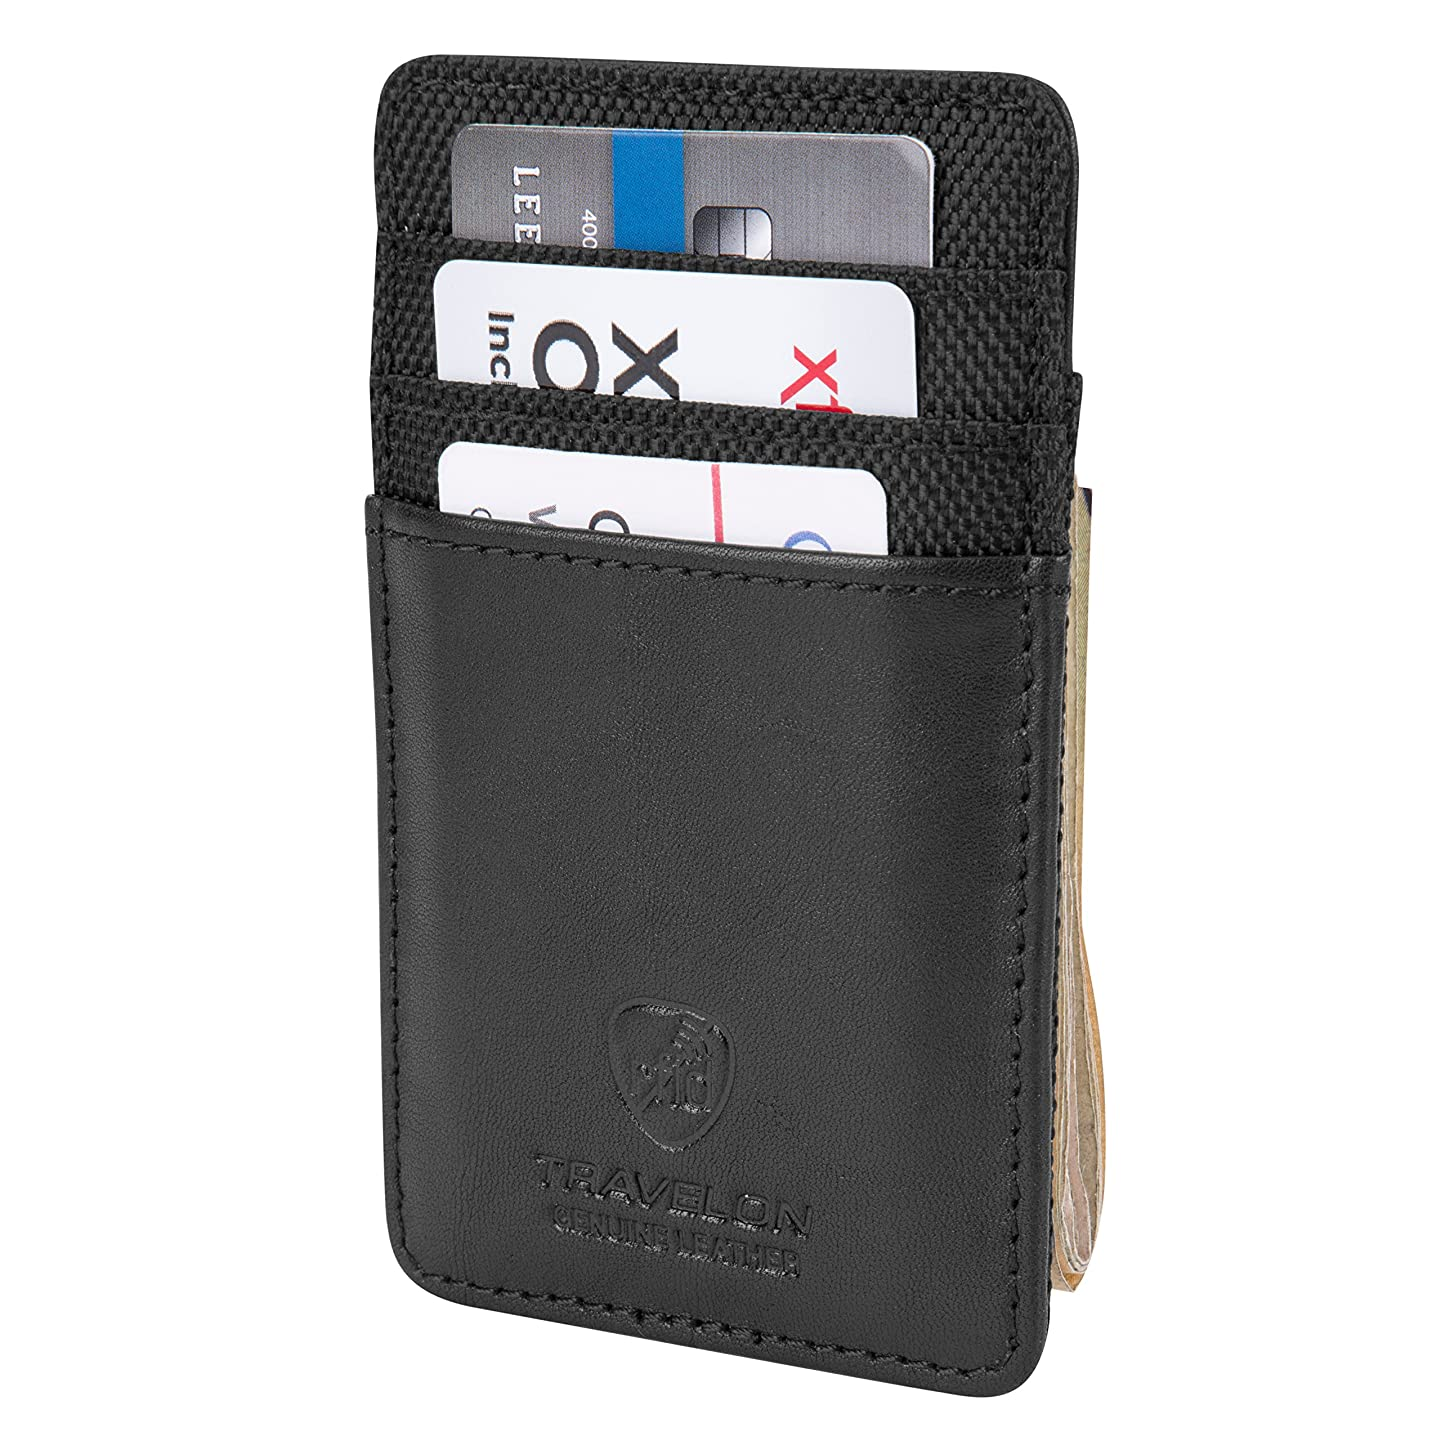 Travelon Safe Id Accent Money Clip Wallet, Black, One Size